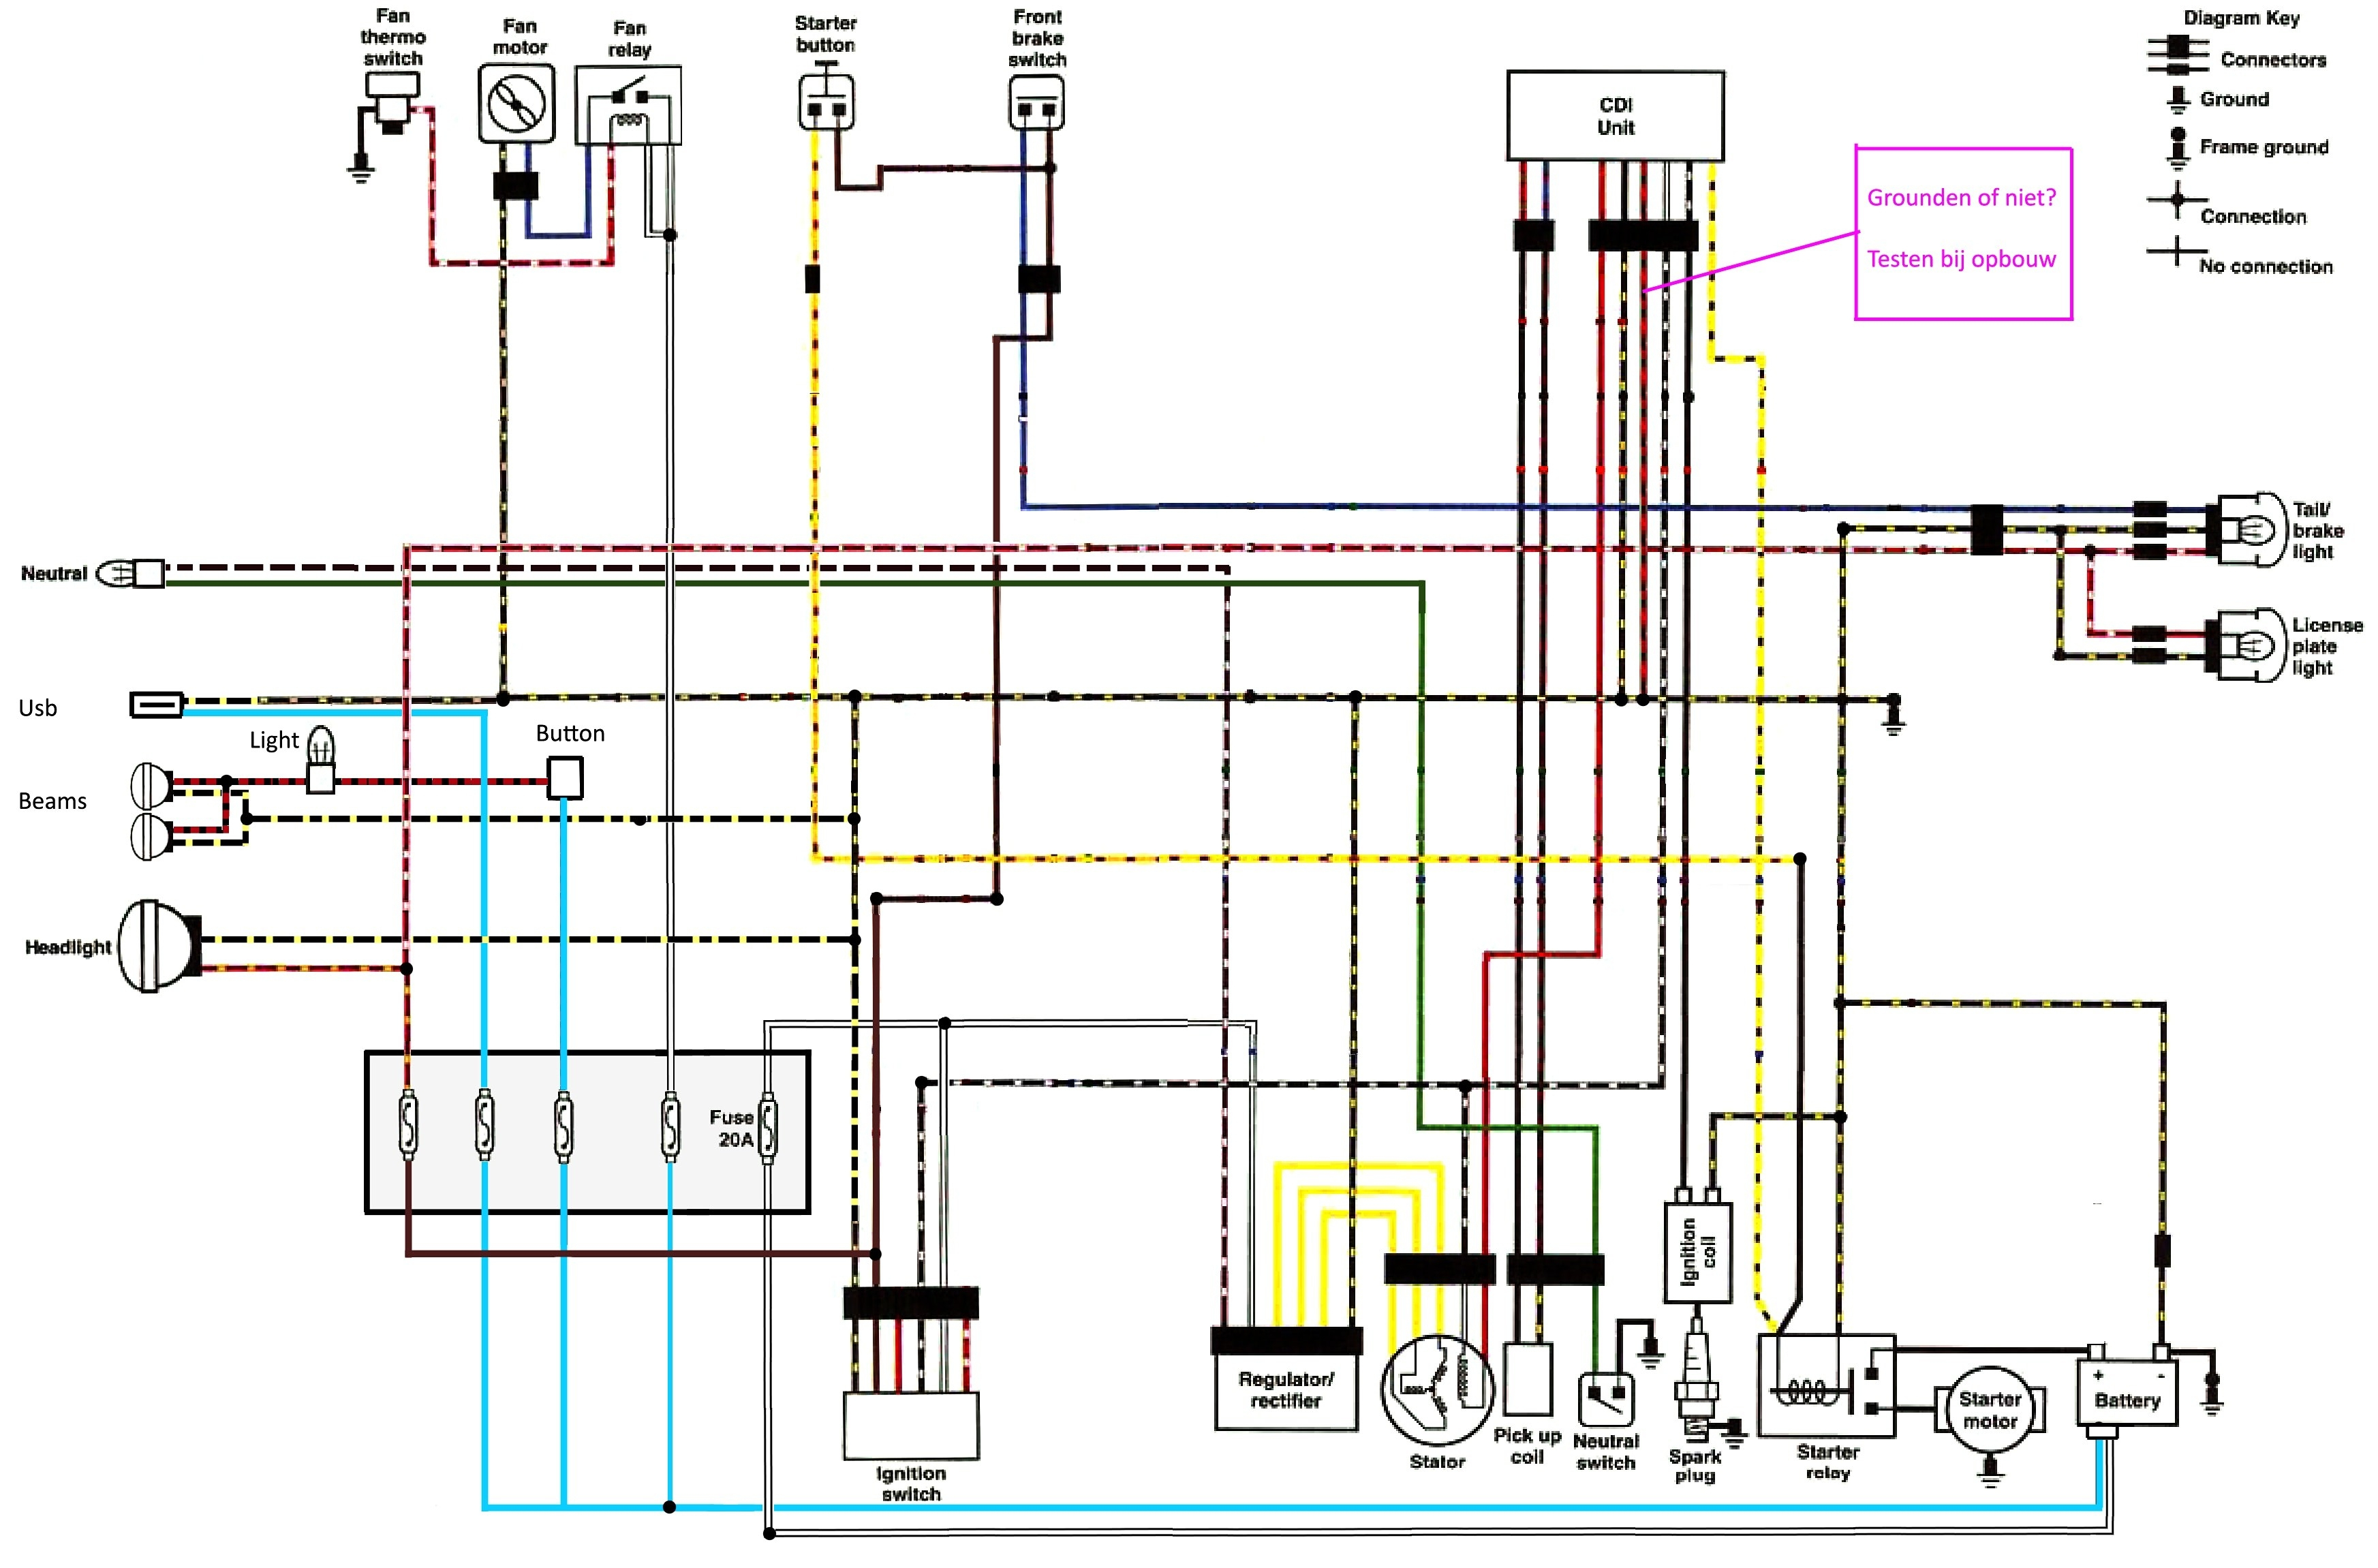 John Deere Lt155 Wiring Diagram   Manual E-Books - John Deere Lt155 Wiring Diagram